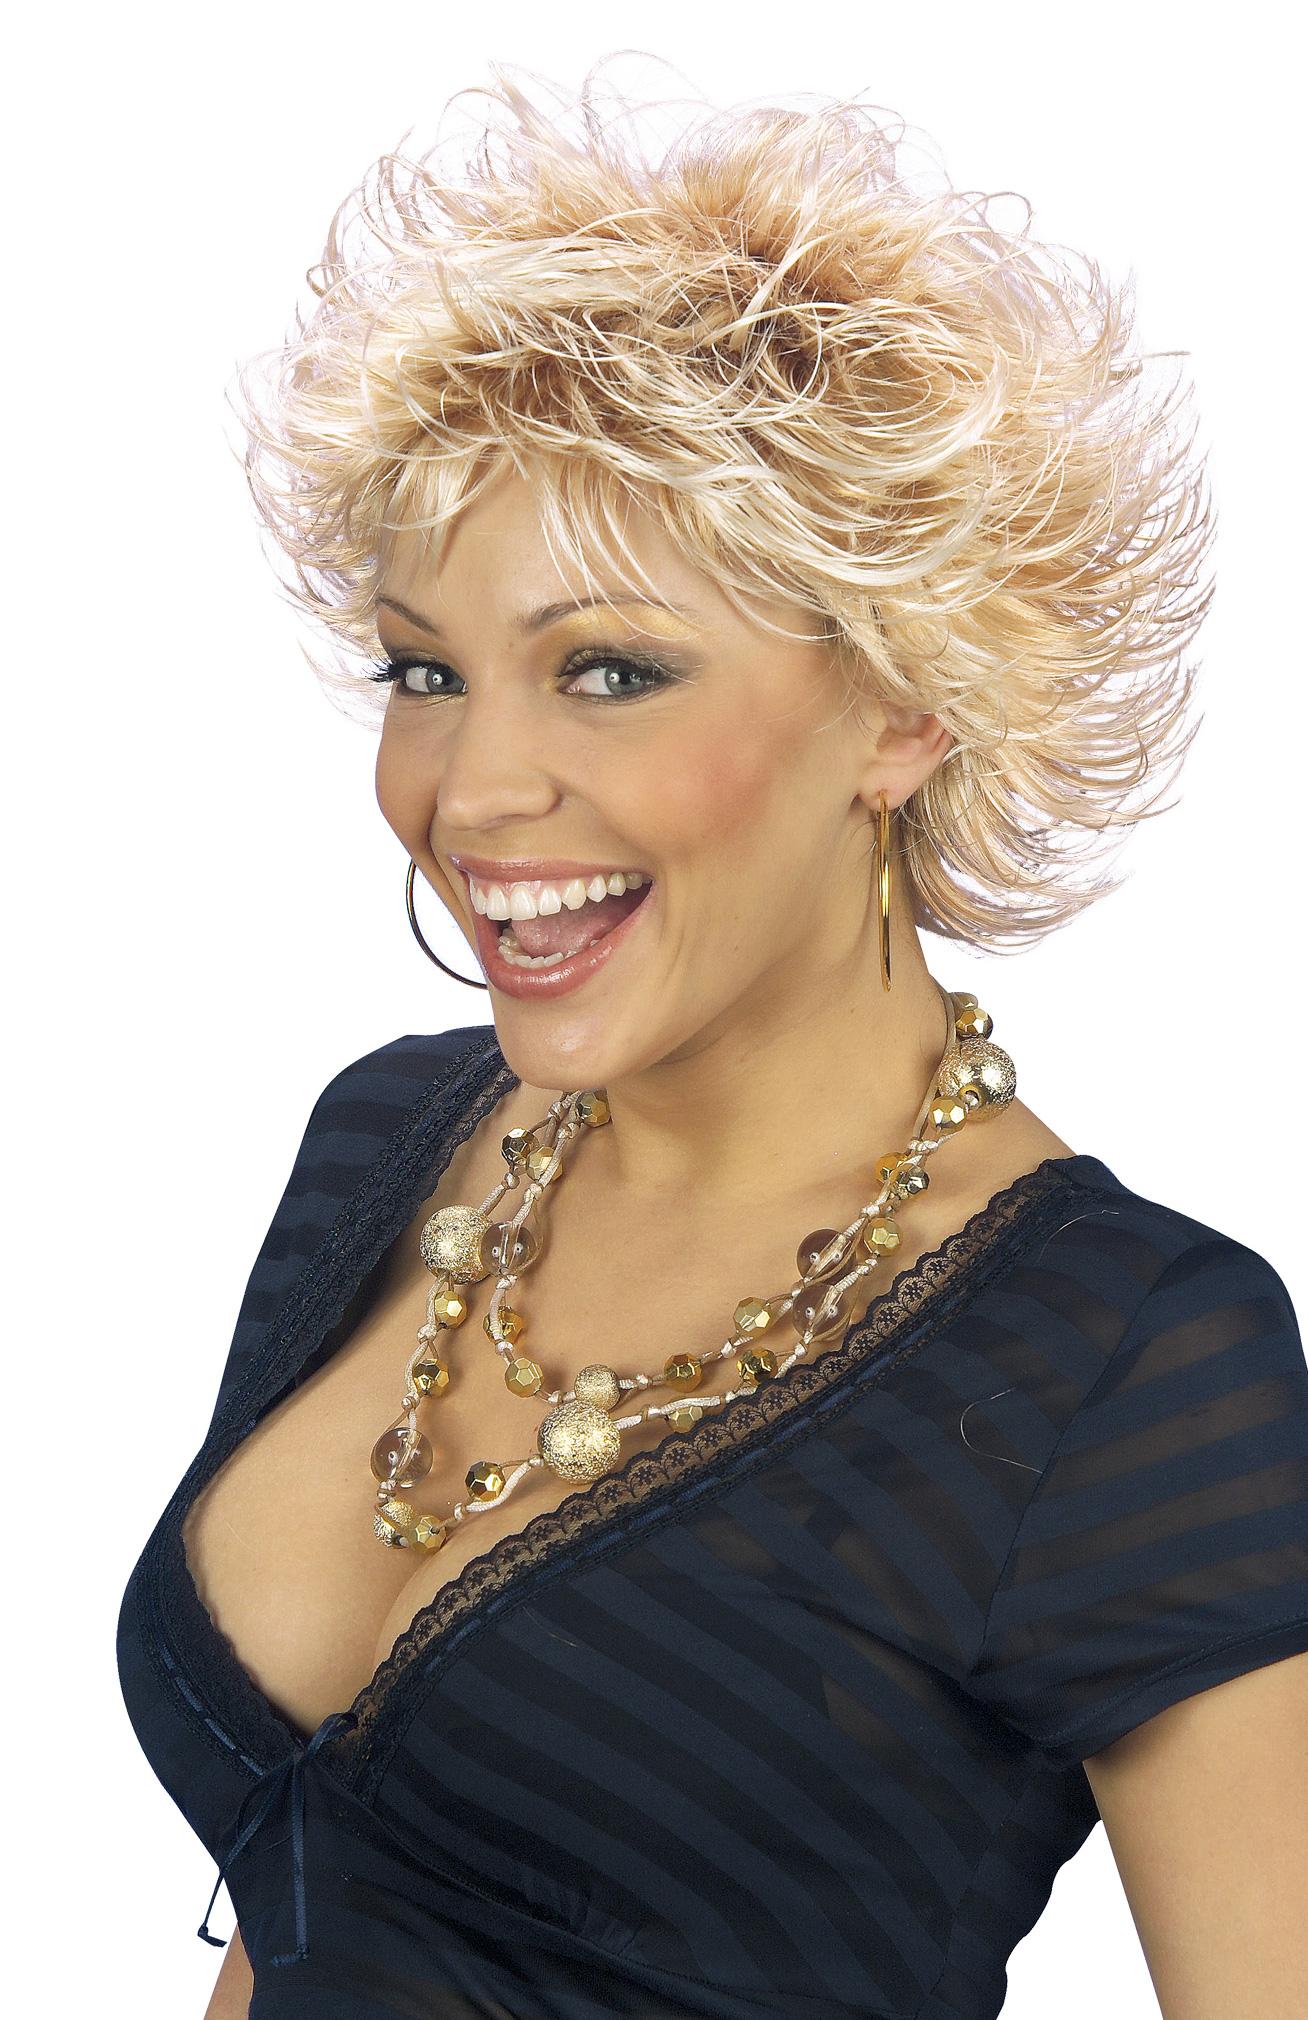 Perruque blonde stylée femme